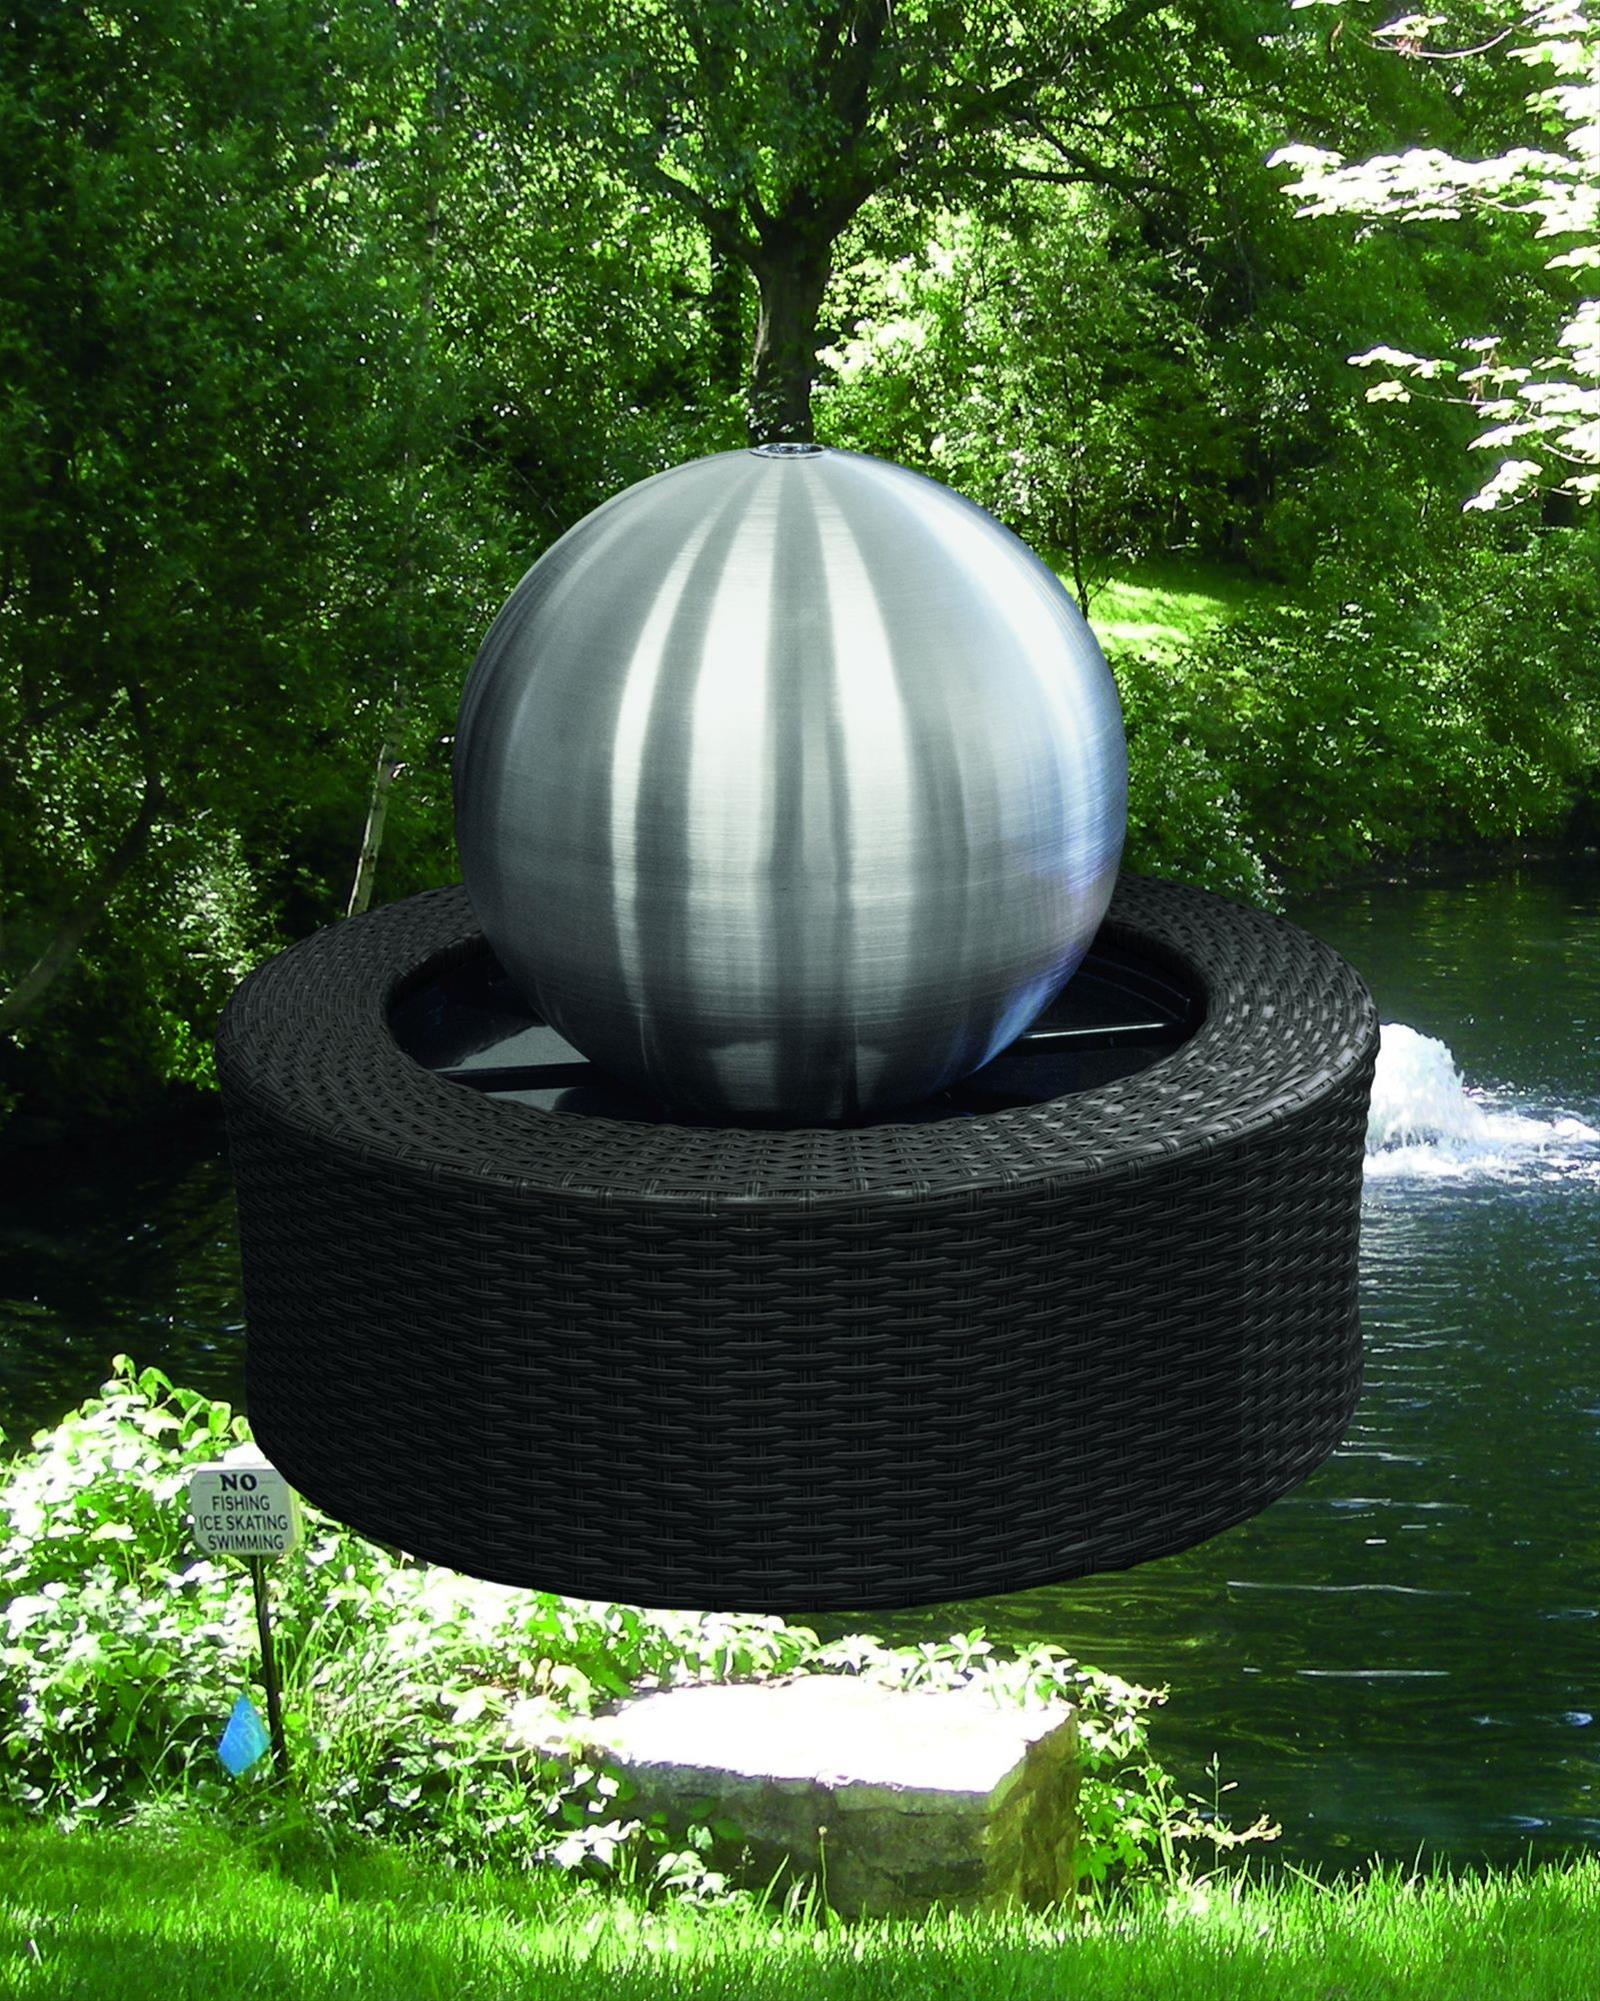 wasserspiel gartenbrunnen gardenforma edelstahl kugel. Black Bedroom Furniture Sets. Home Design Ideas